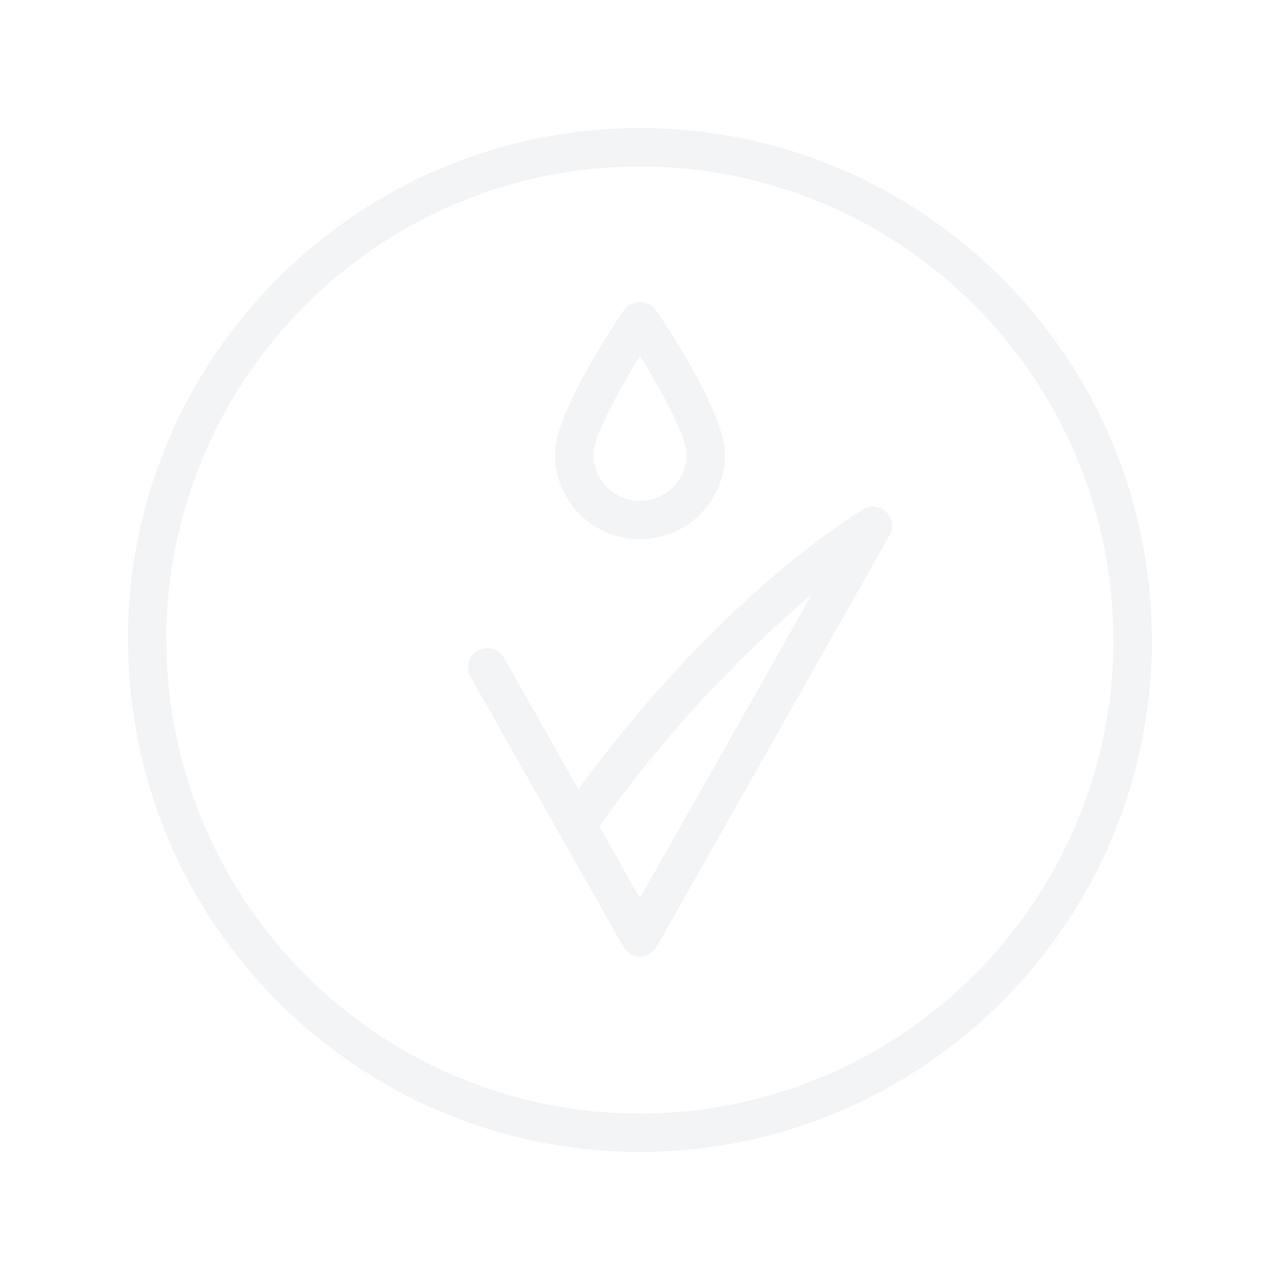 LUUV Natural Self Tanning Oil Medium 100ml